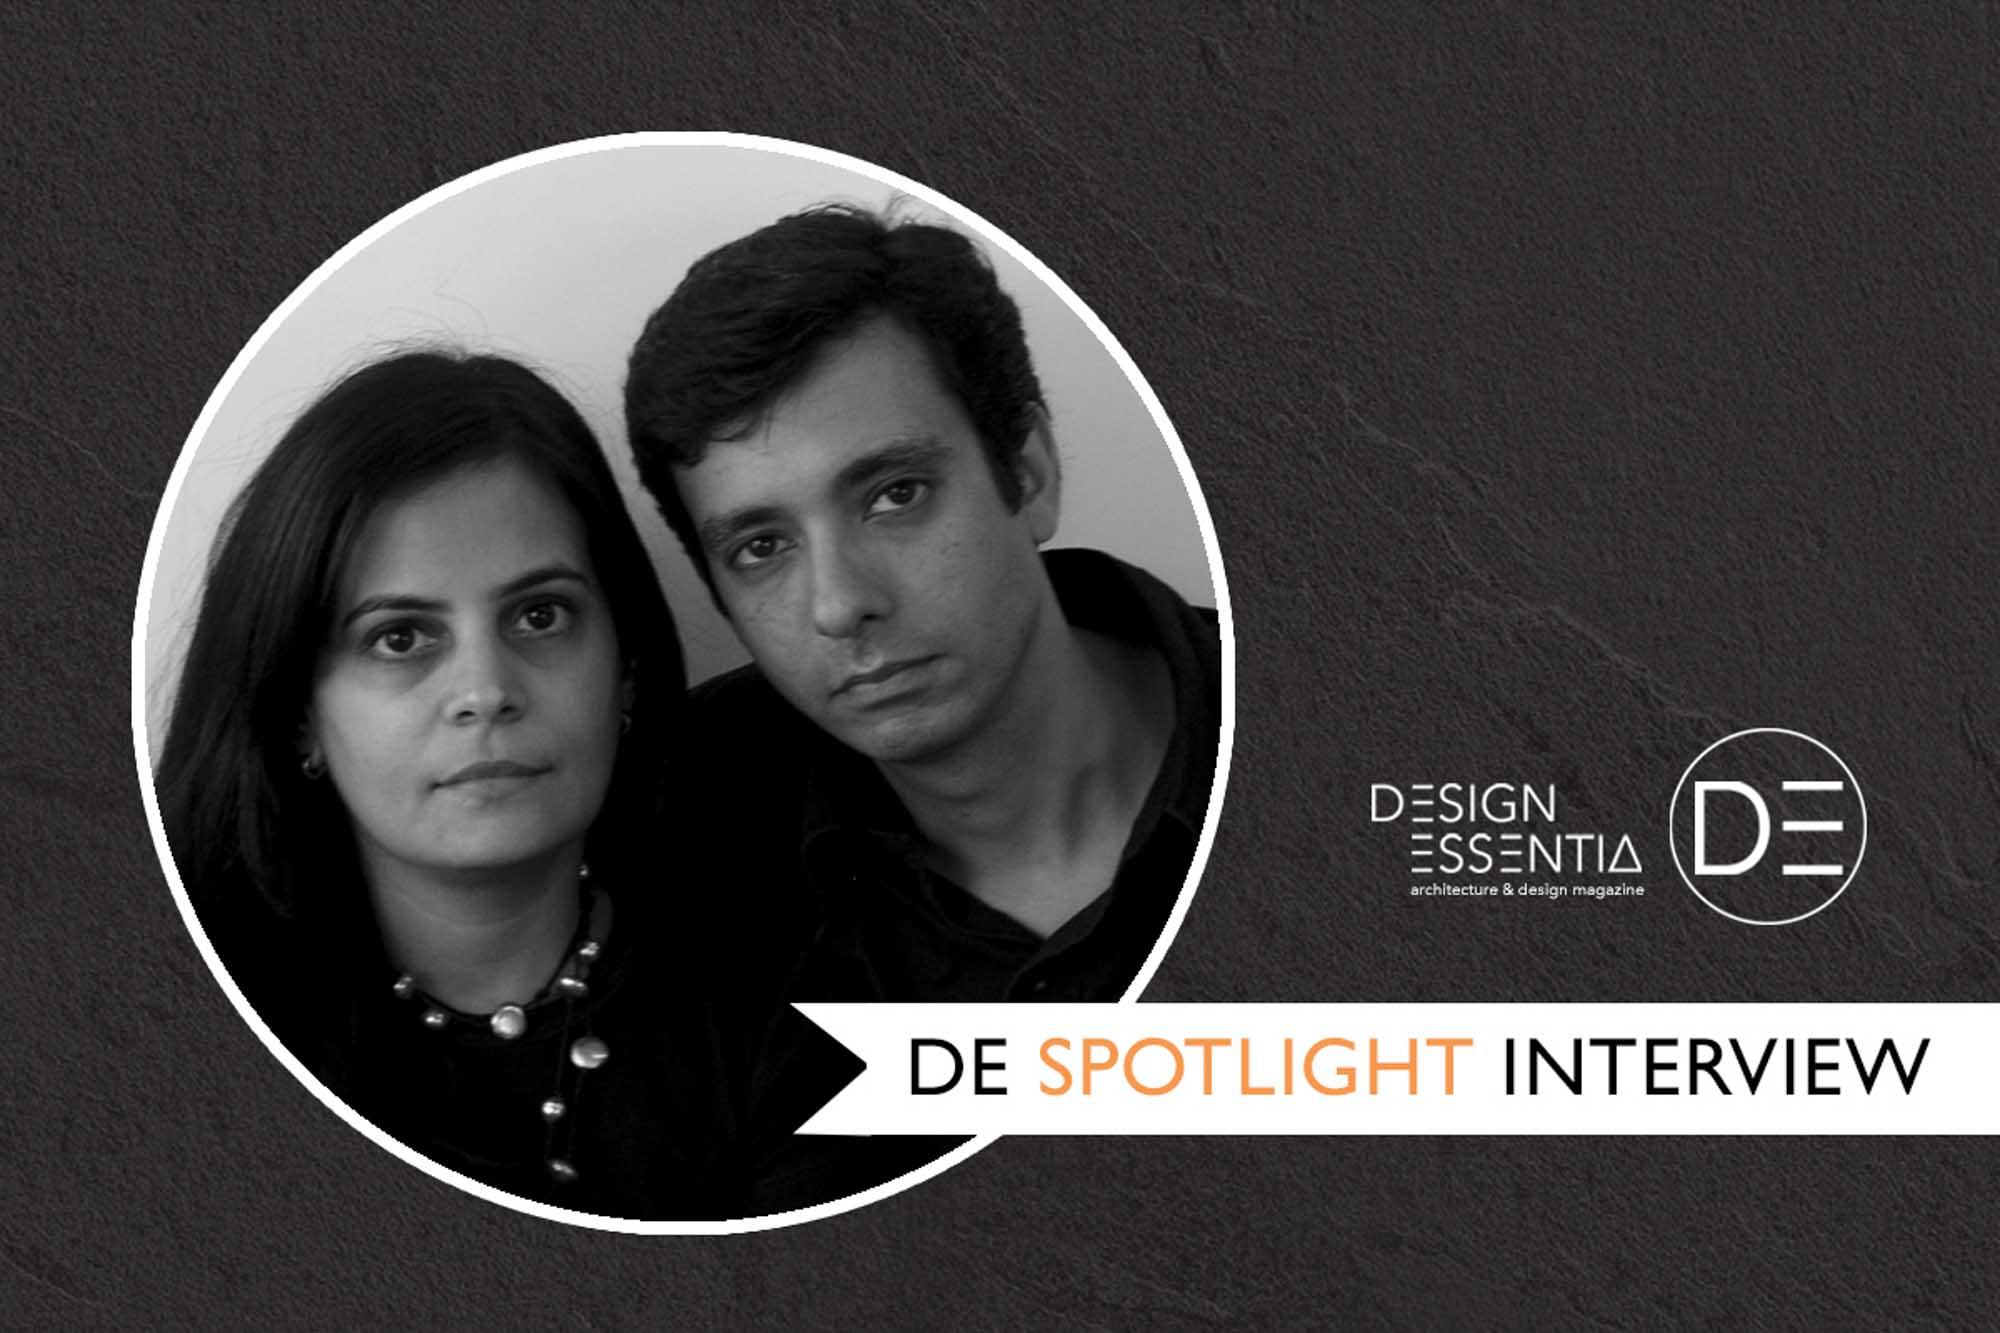 In conversation with architects Sanjeev Panjabi and Sangeeta Merchant.